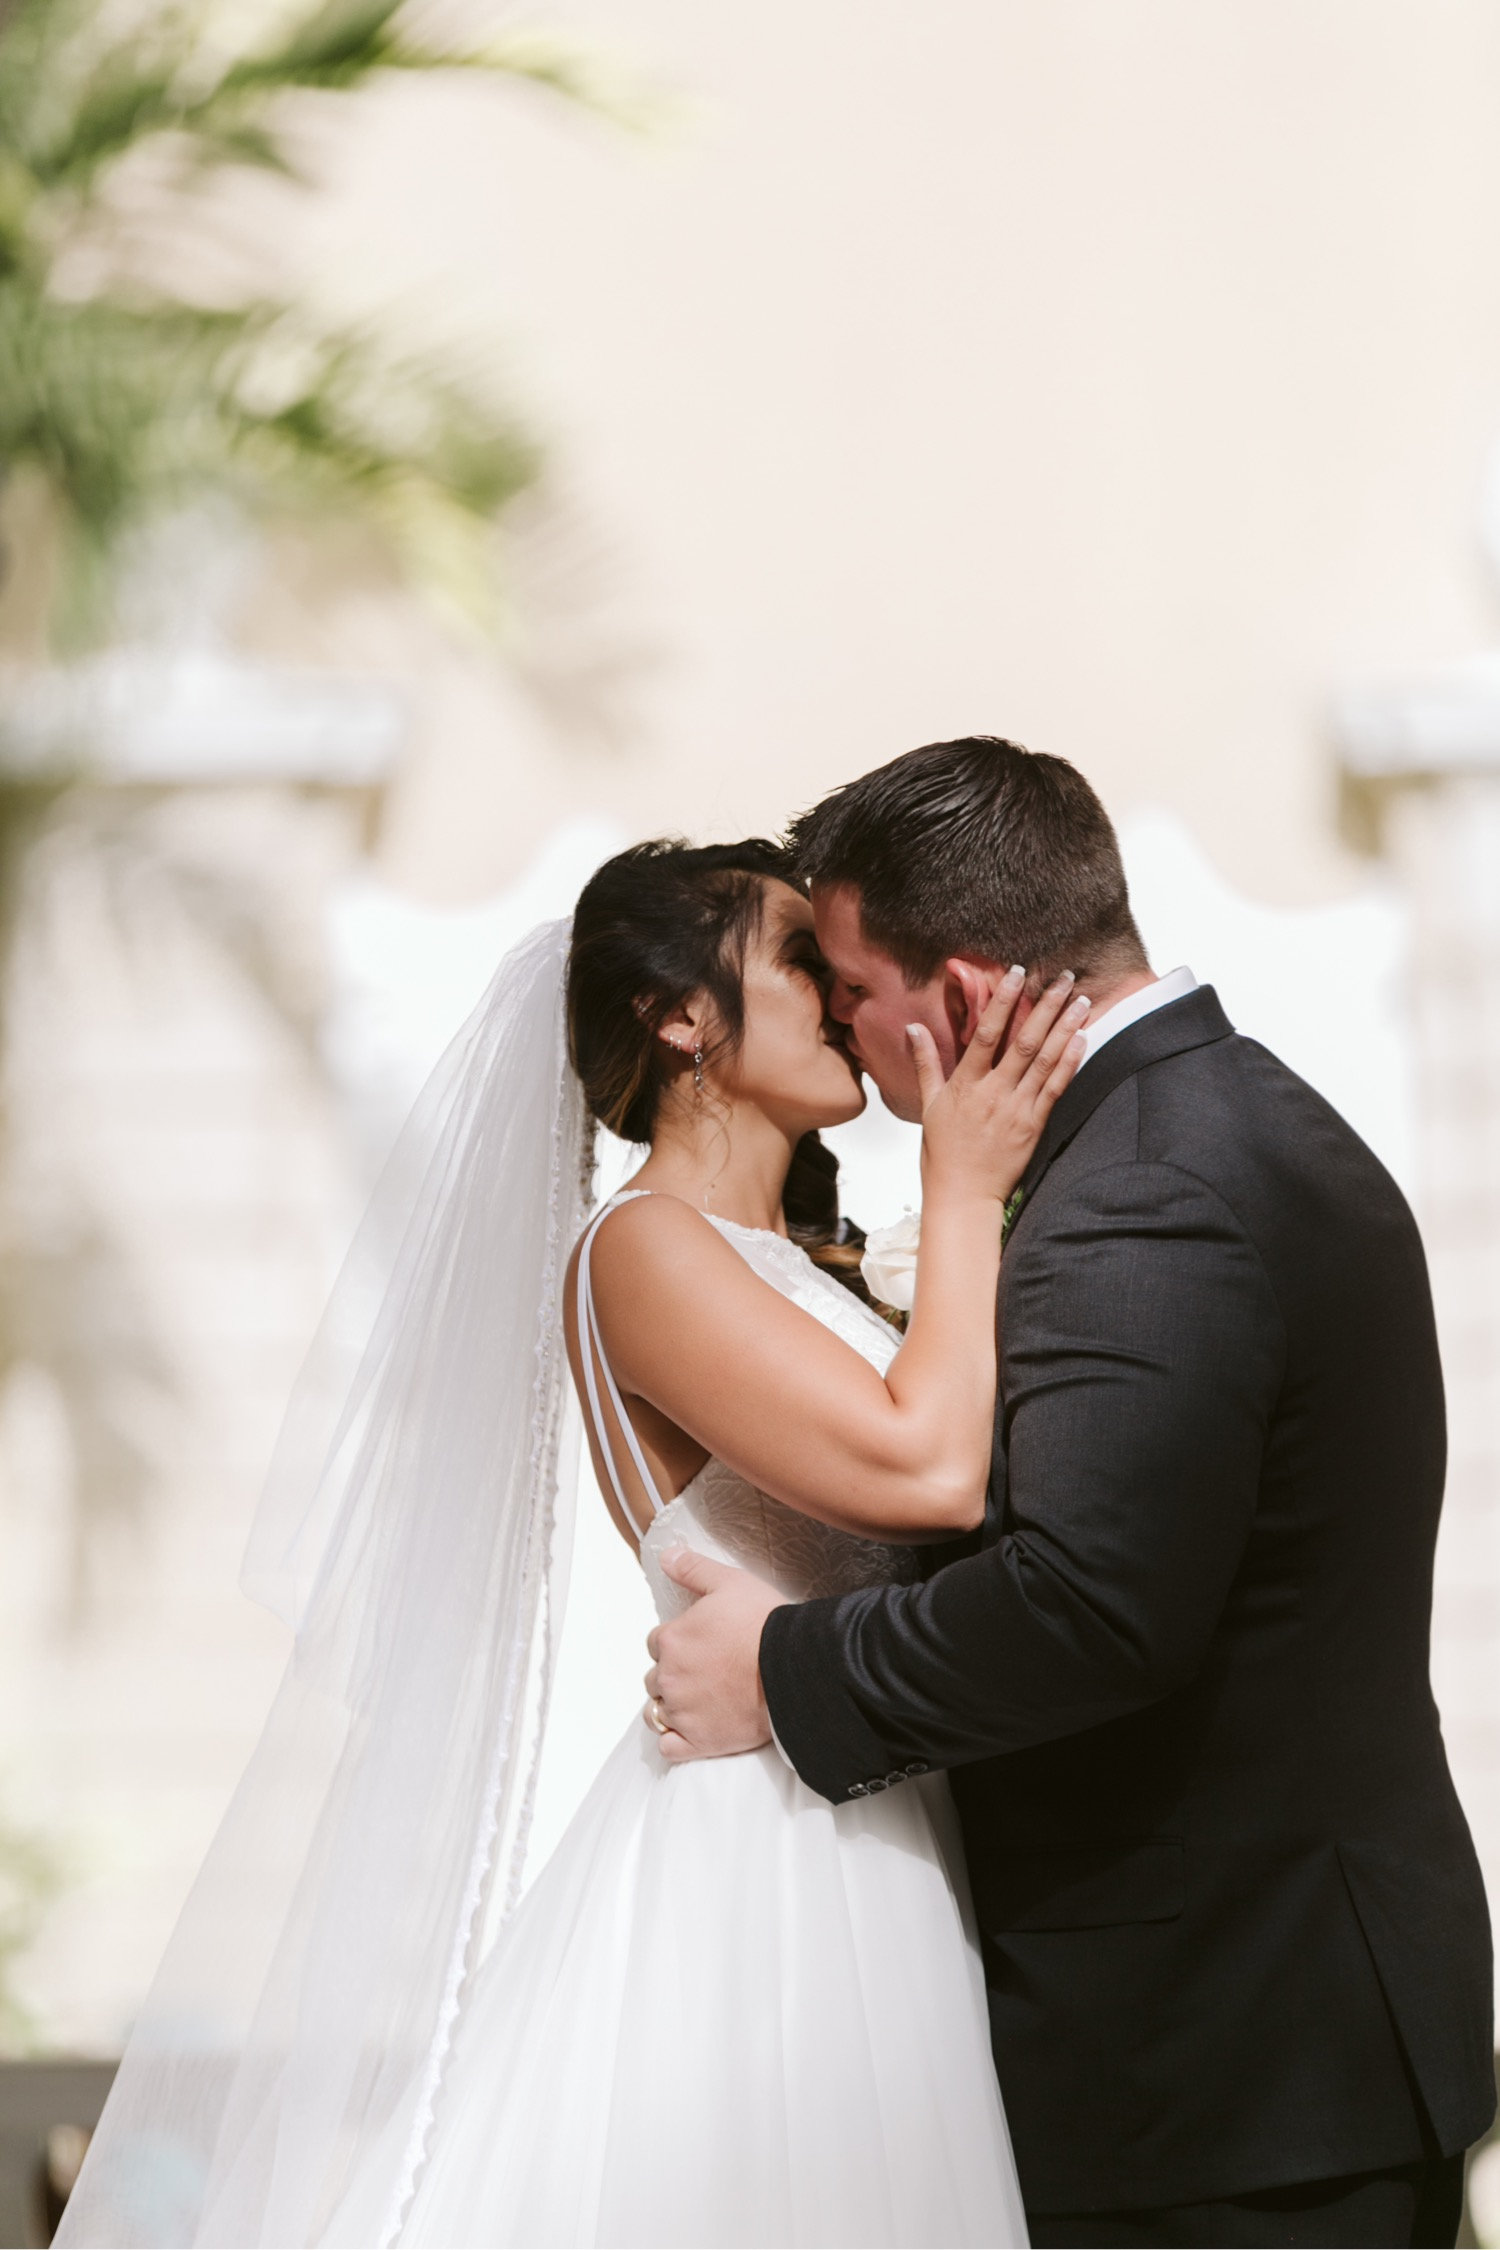 Cafe_Kiss_Julia_Ceremony_Honolulu_Hawaii_Wedding.jpg